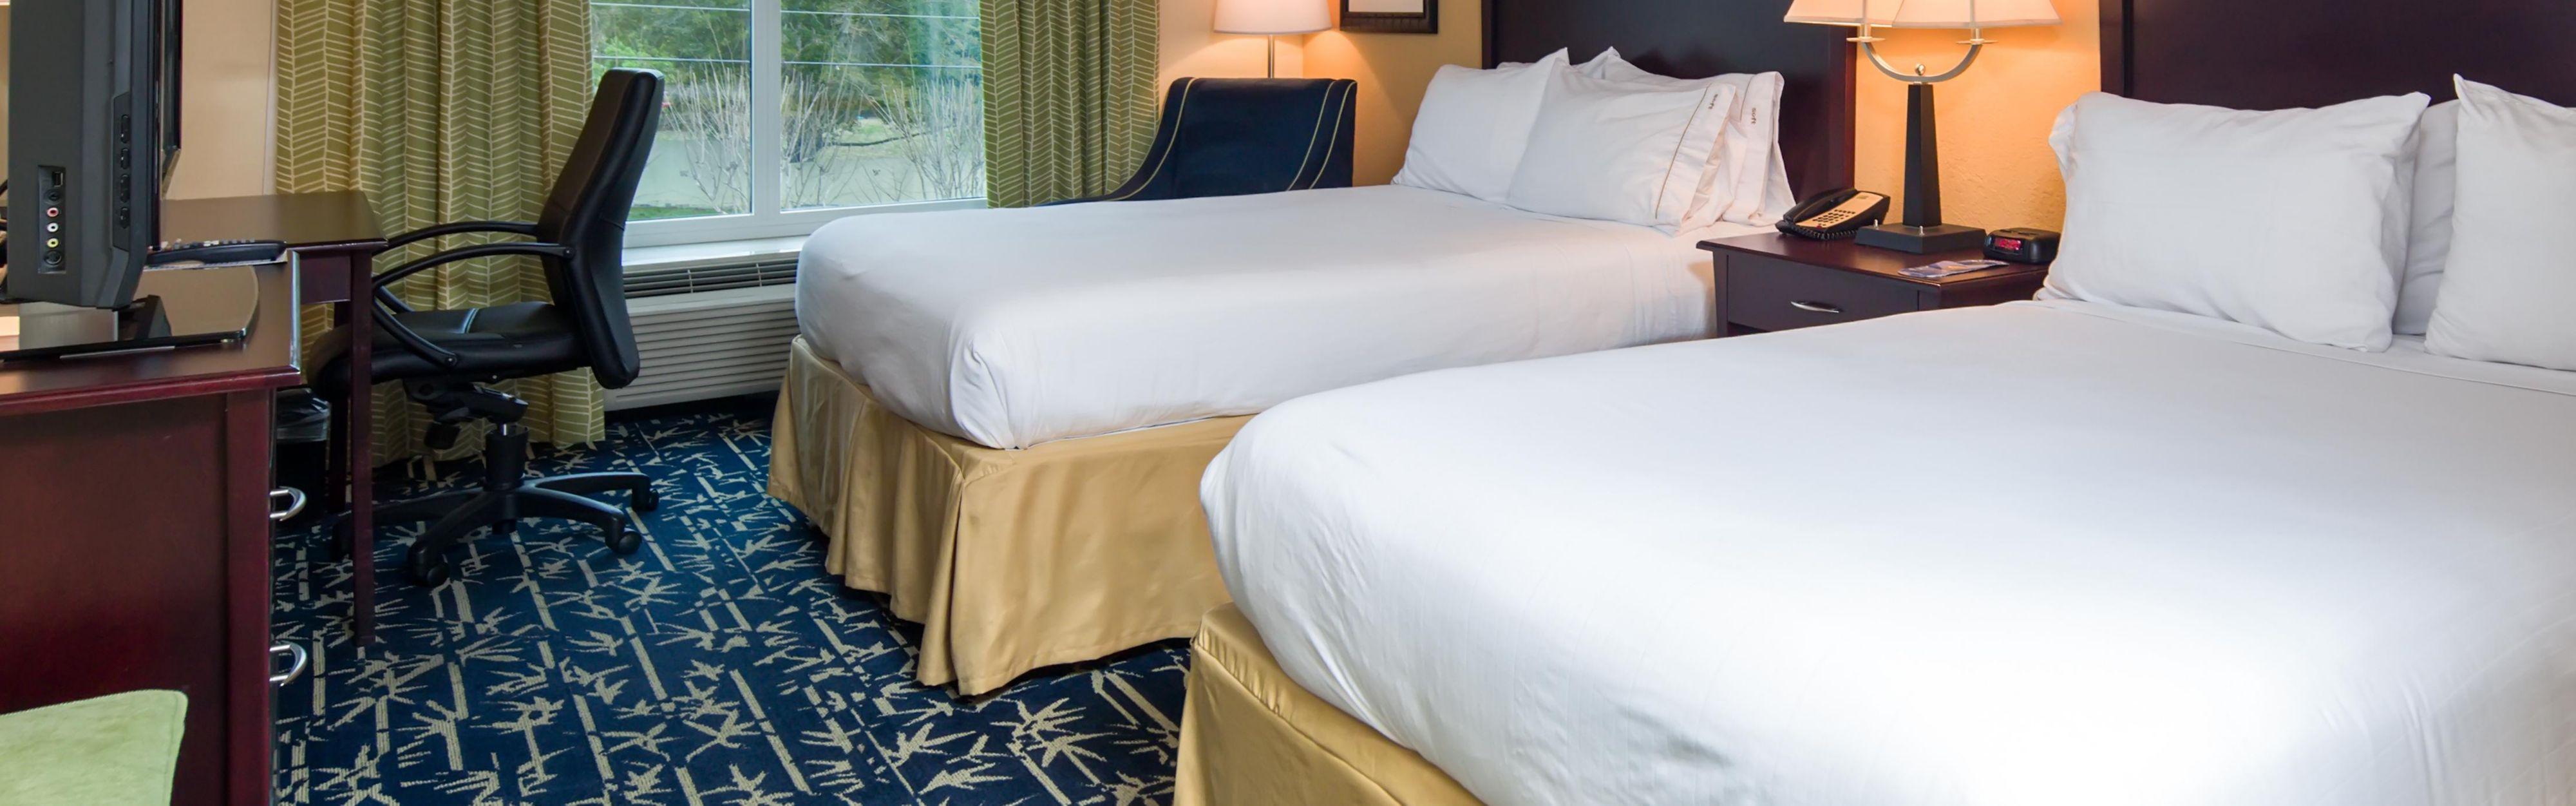 Holiday Inn Express & Suites Orlando - Apopka image 1